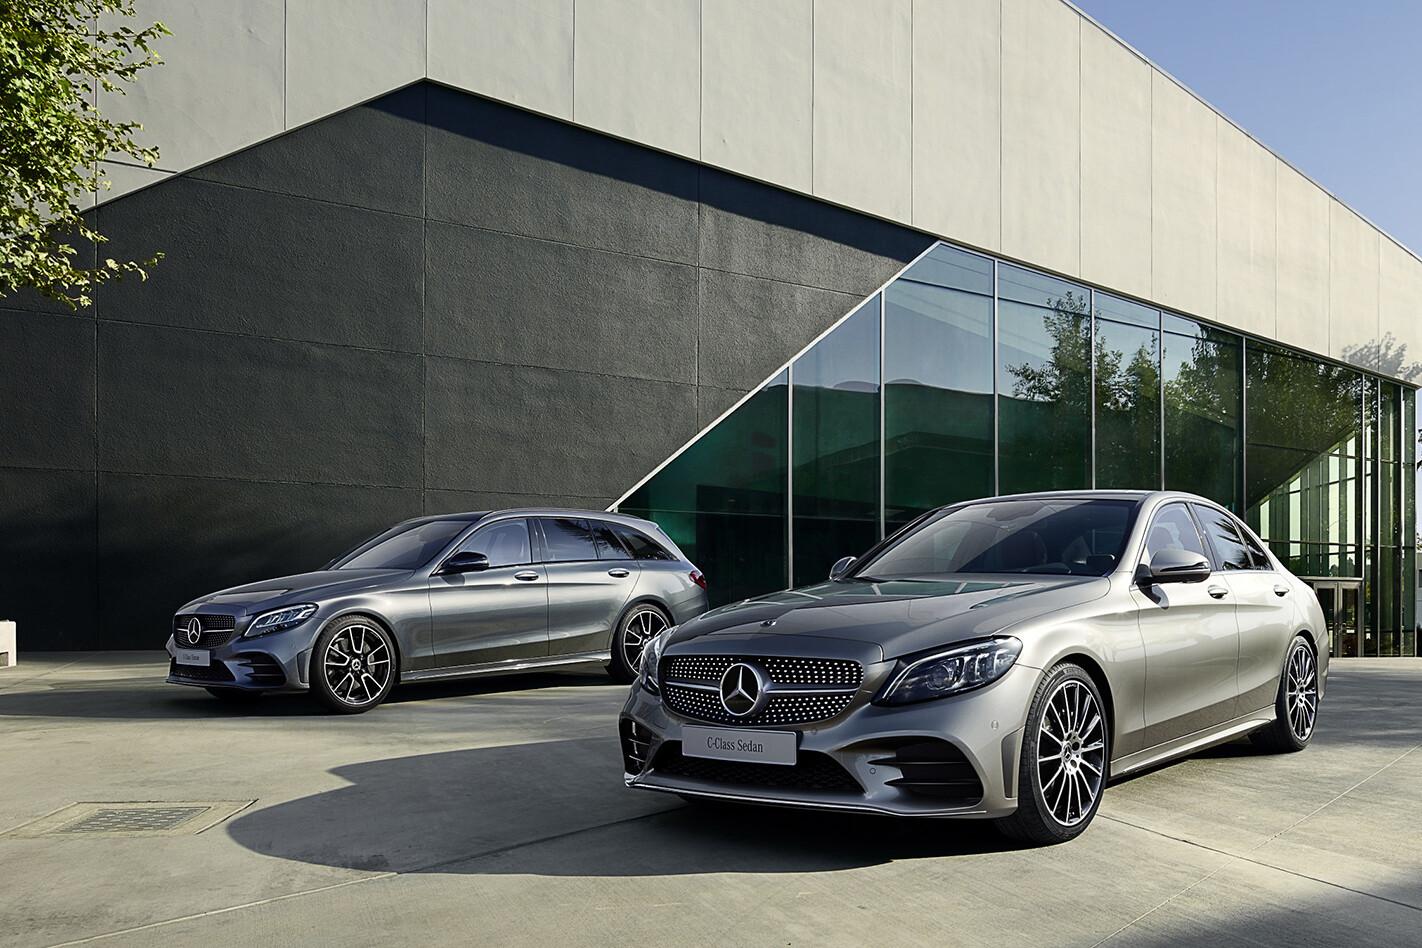 Mercedes-benz c-class sedan and estate